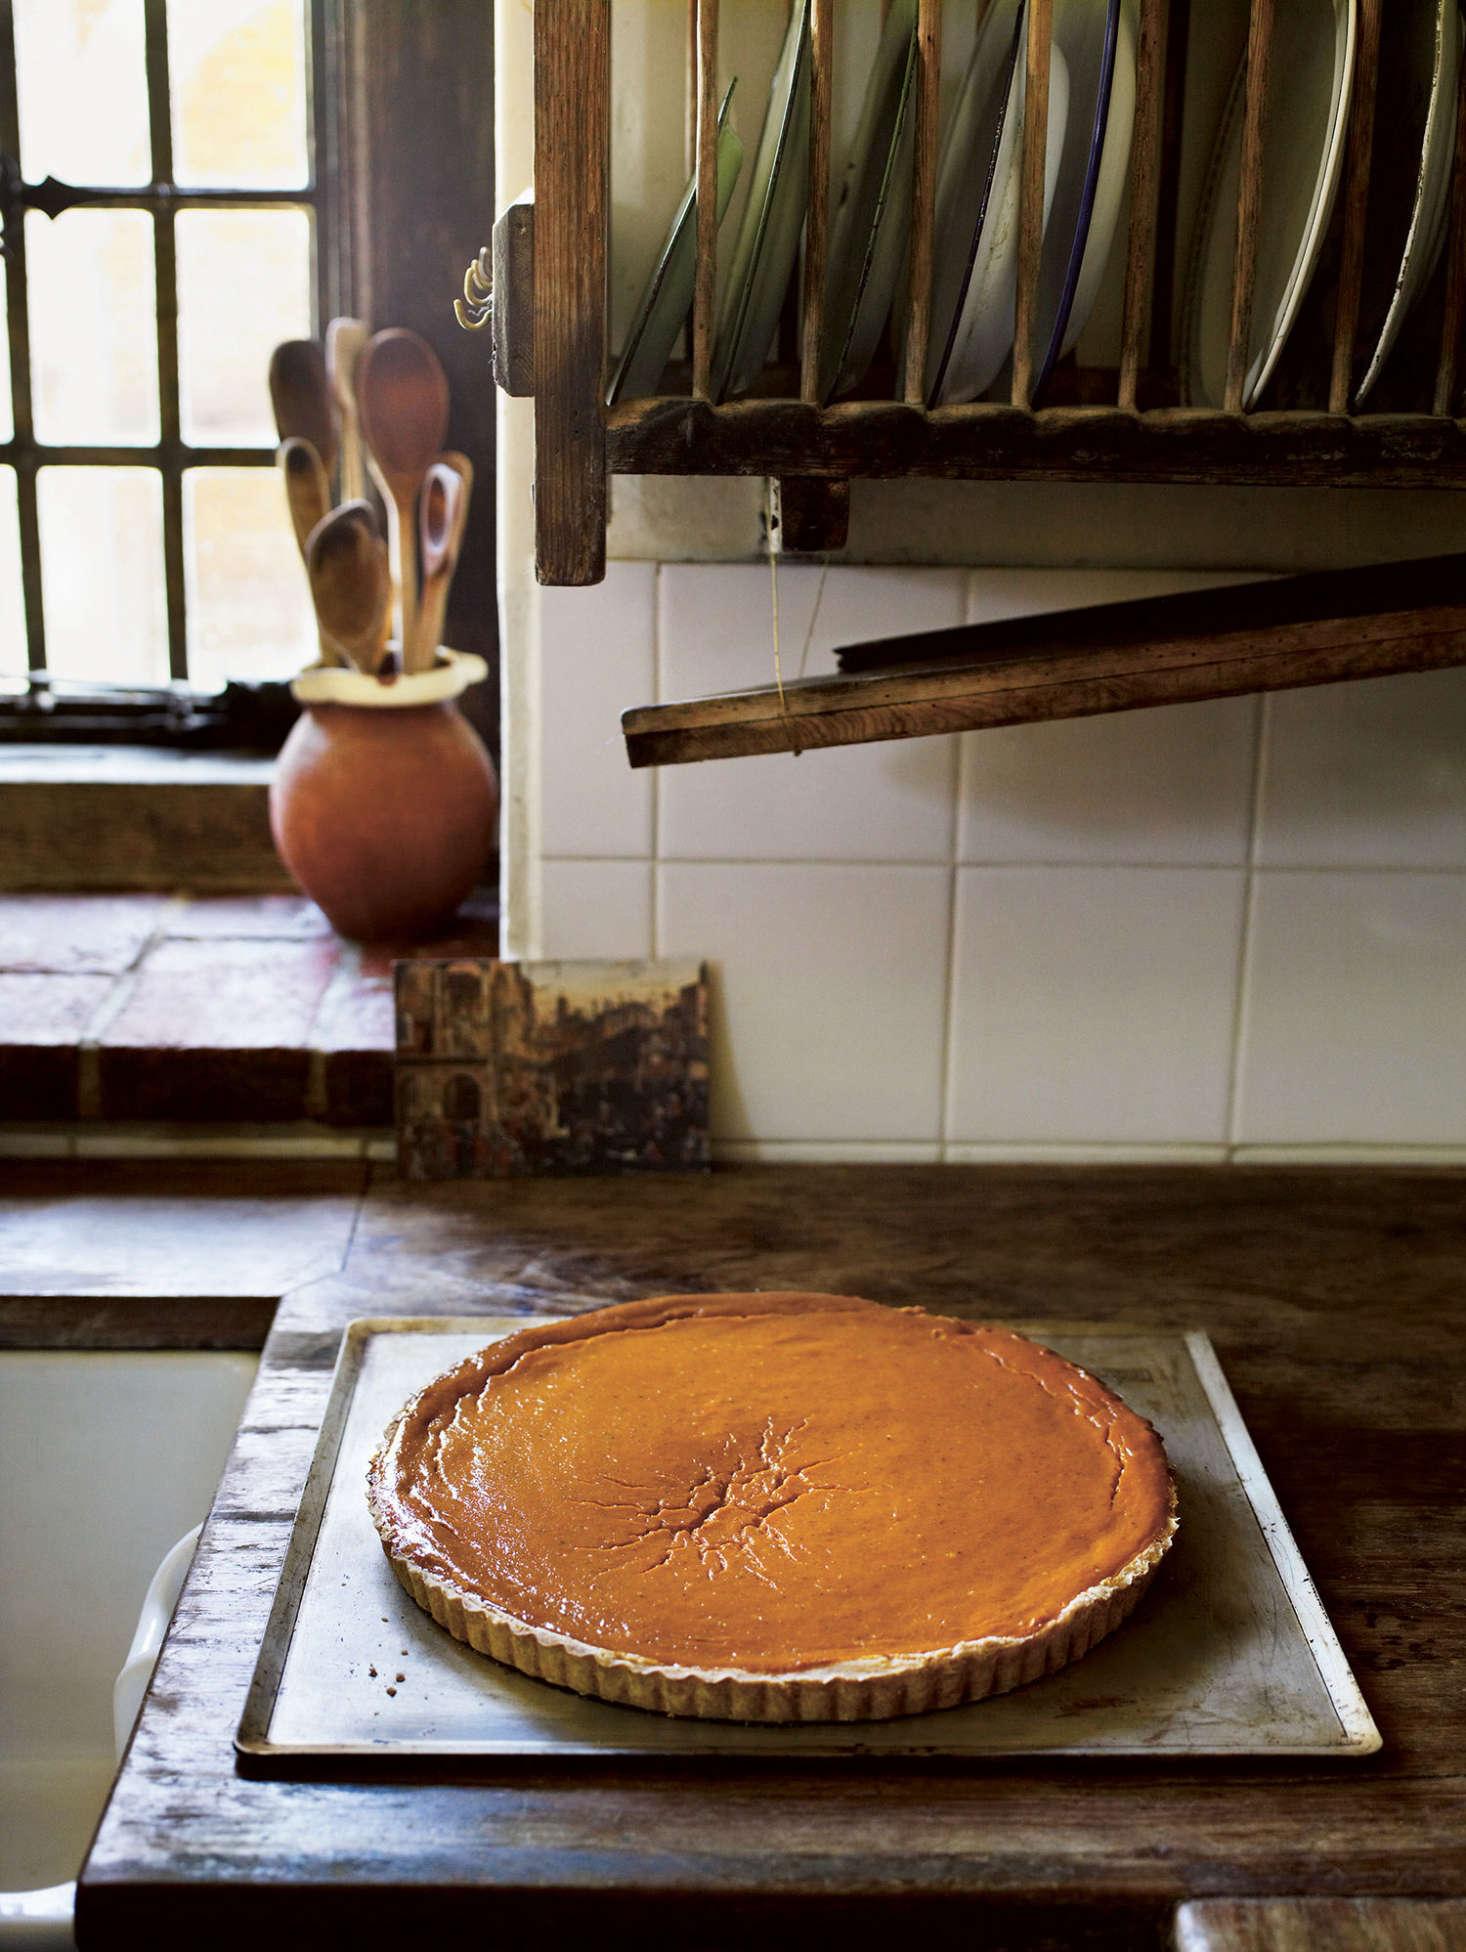 Pumpkin pie from The Great Dixter Cookbook.